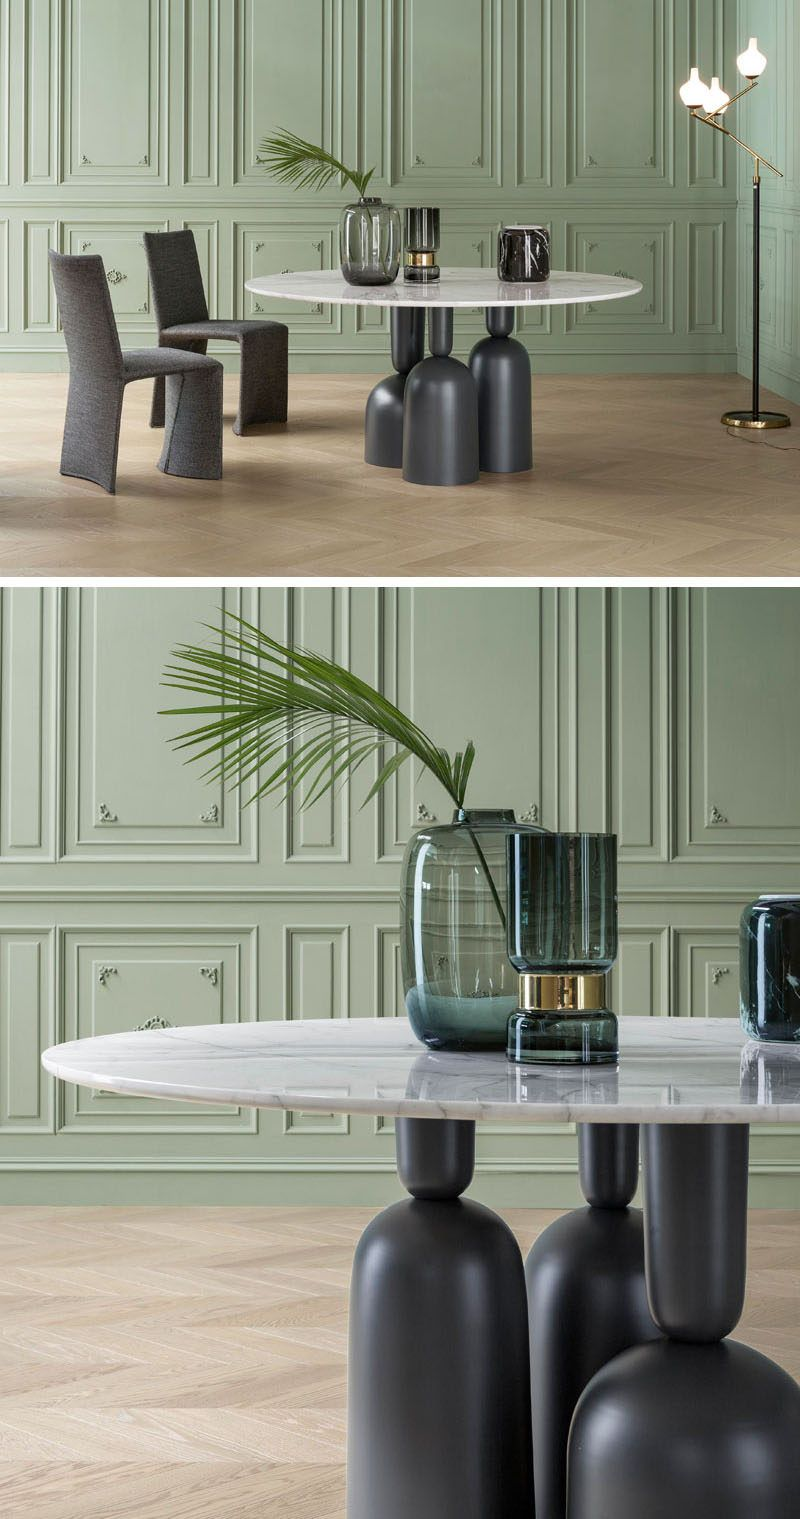 Roberto Paoli Designs The Cop Table For Bonaldo  Italian Adorable How To Become A Kitchen Designer Design Ideas